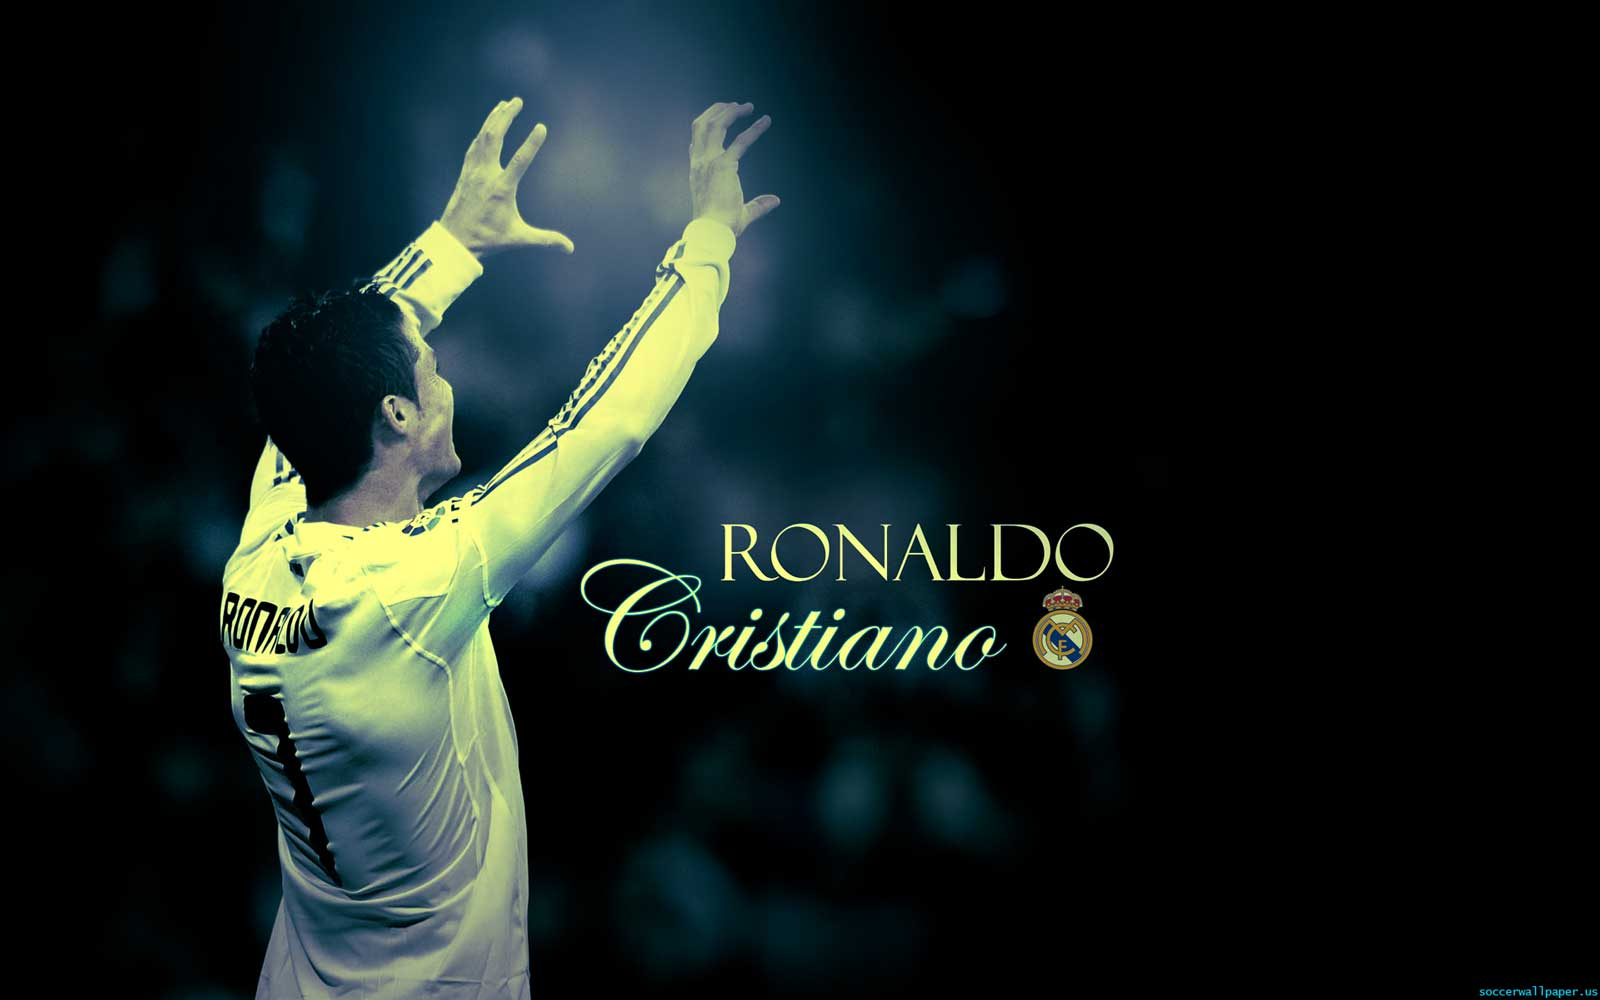 Cristiano Ronaldo Real Madrid Wallpaper HD 2014 3 1600x1000